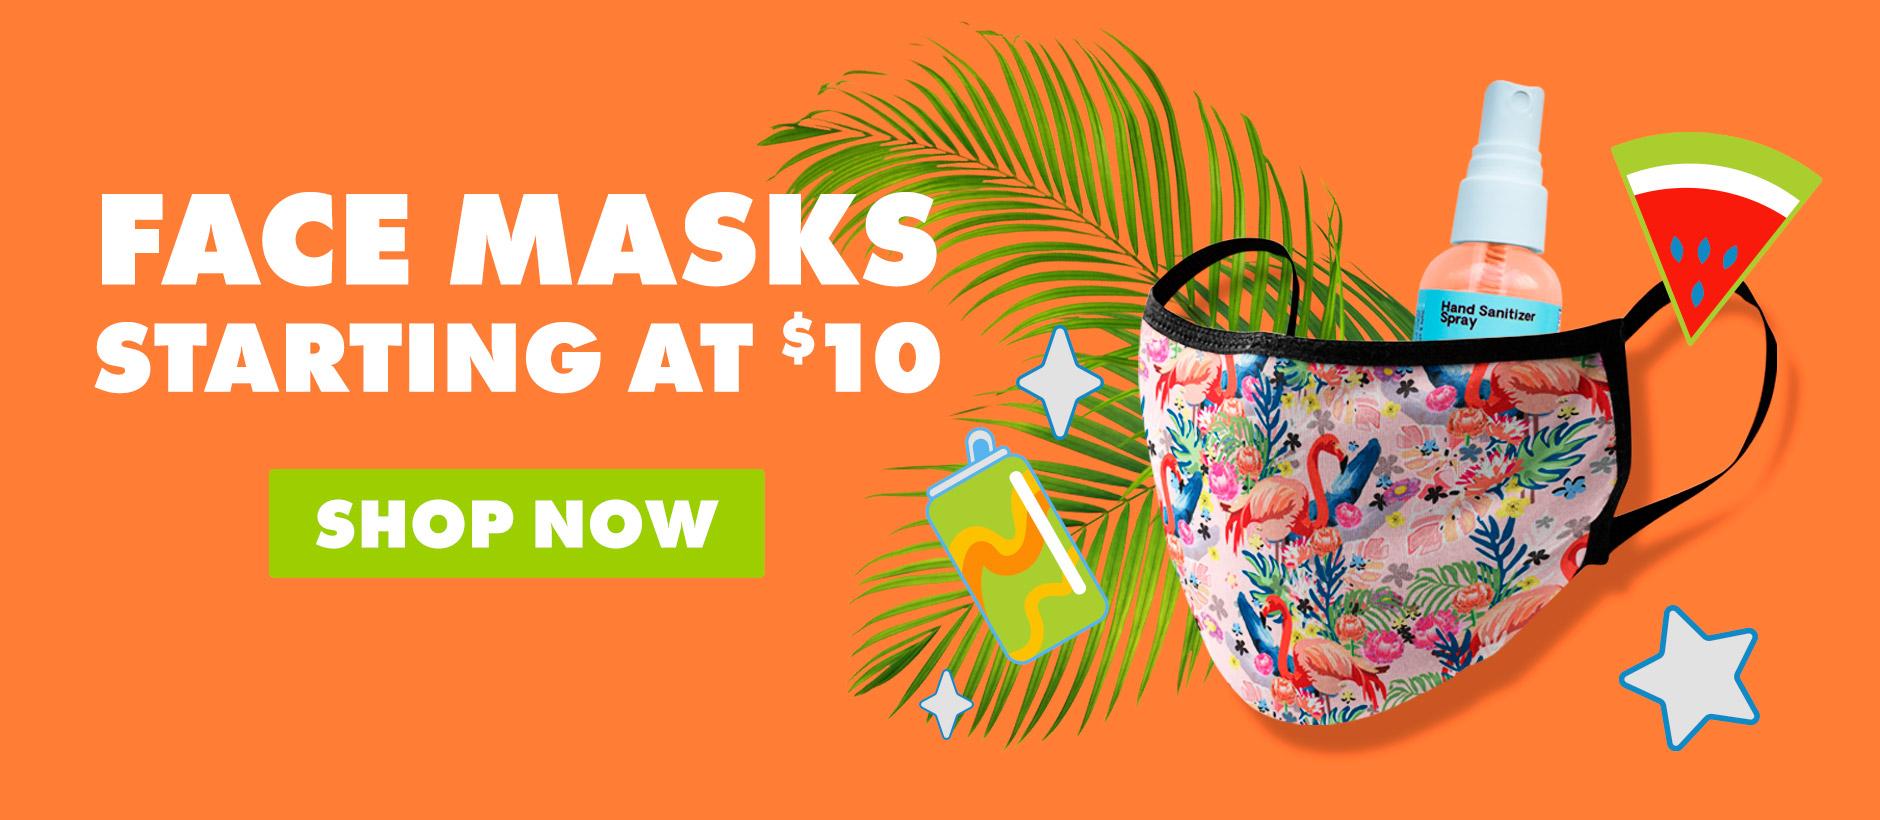 Shop Face Masks starting at $10